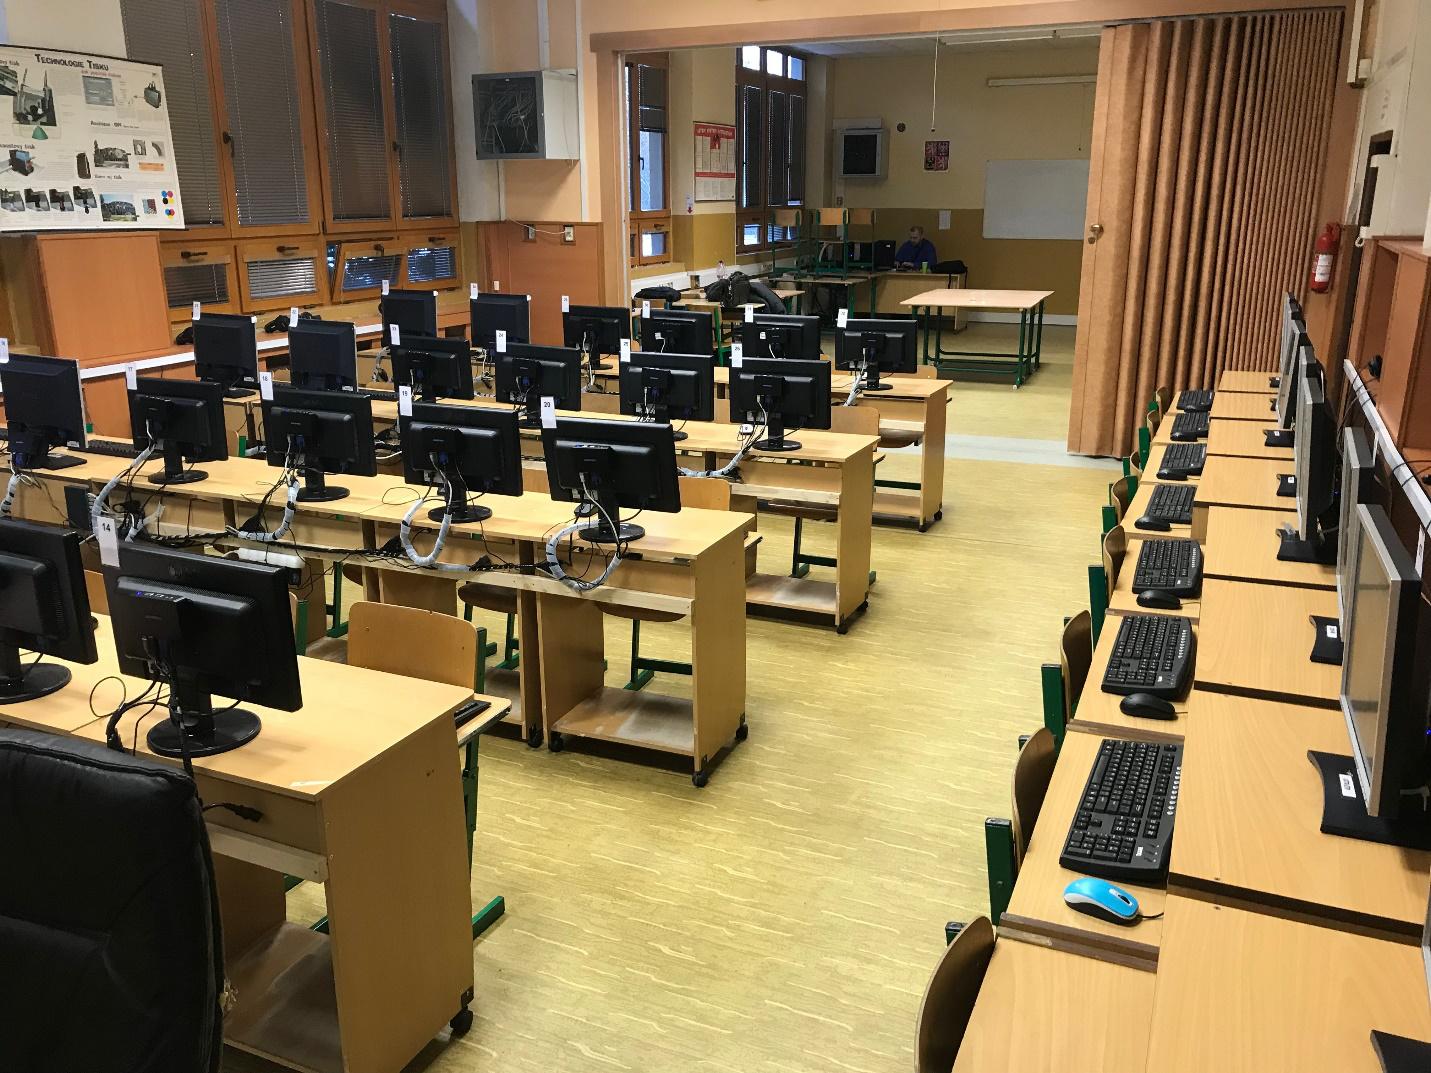 Brigadniku-Praha-Primary-school-in-Slovakia2.png